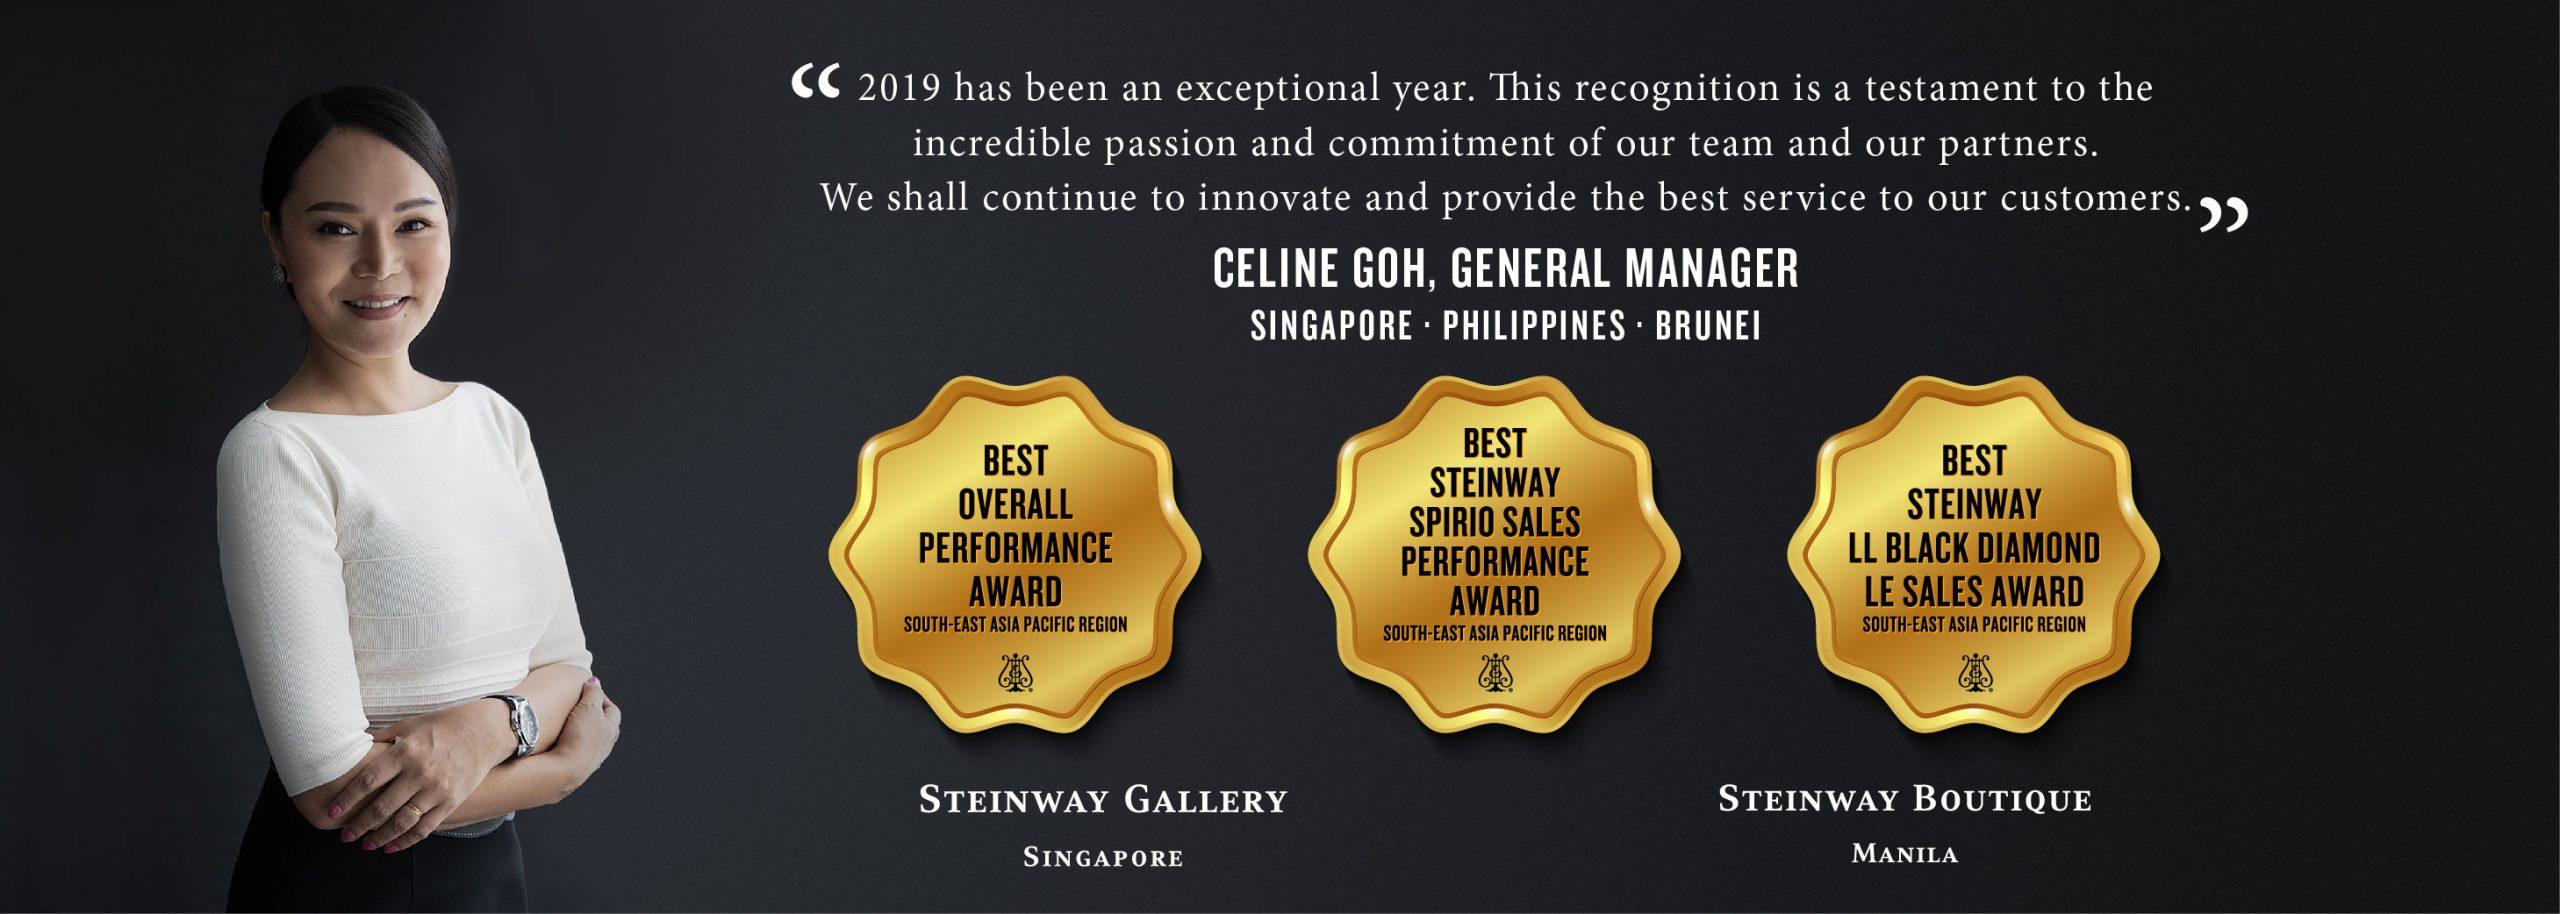 Awards Banner V2 01 1 Scaled